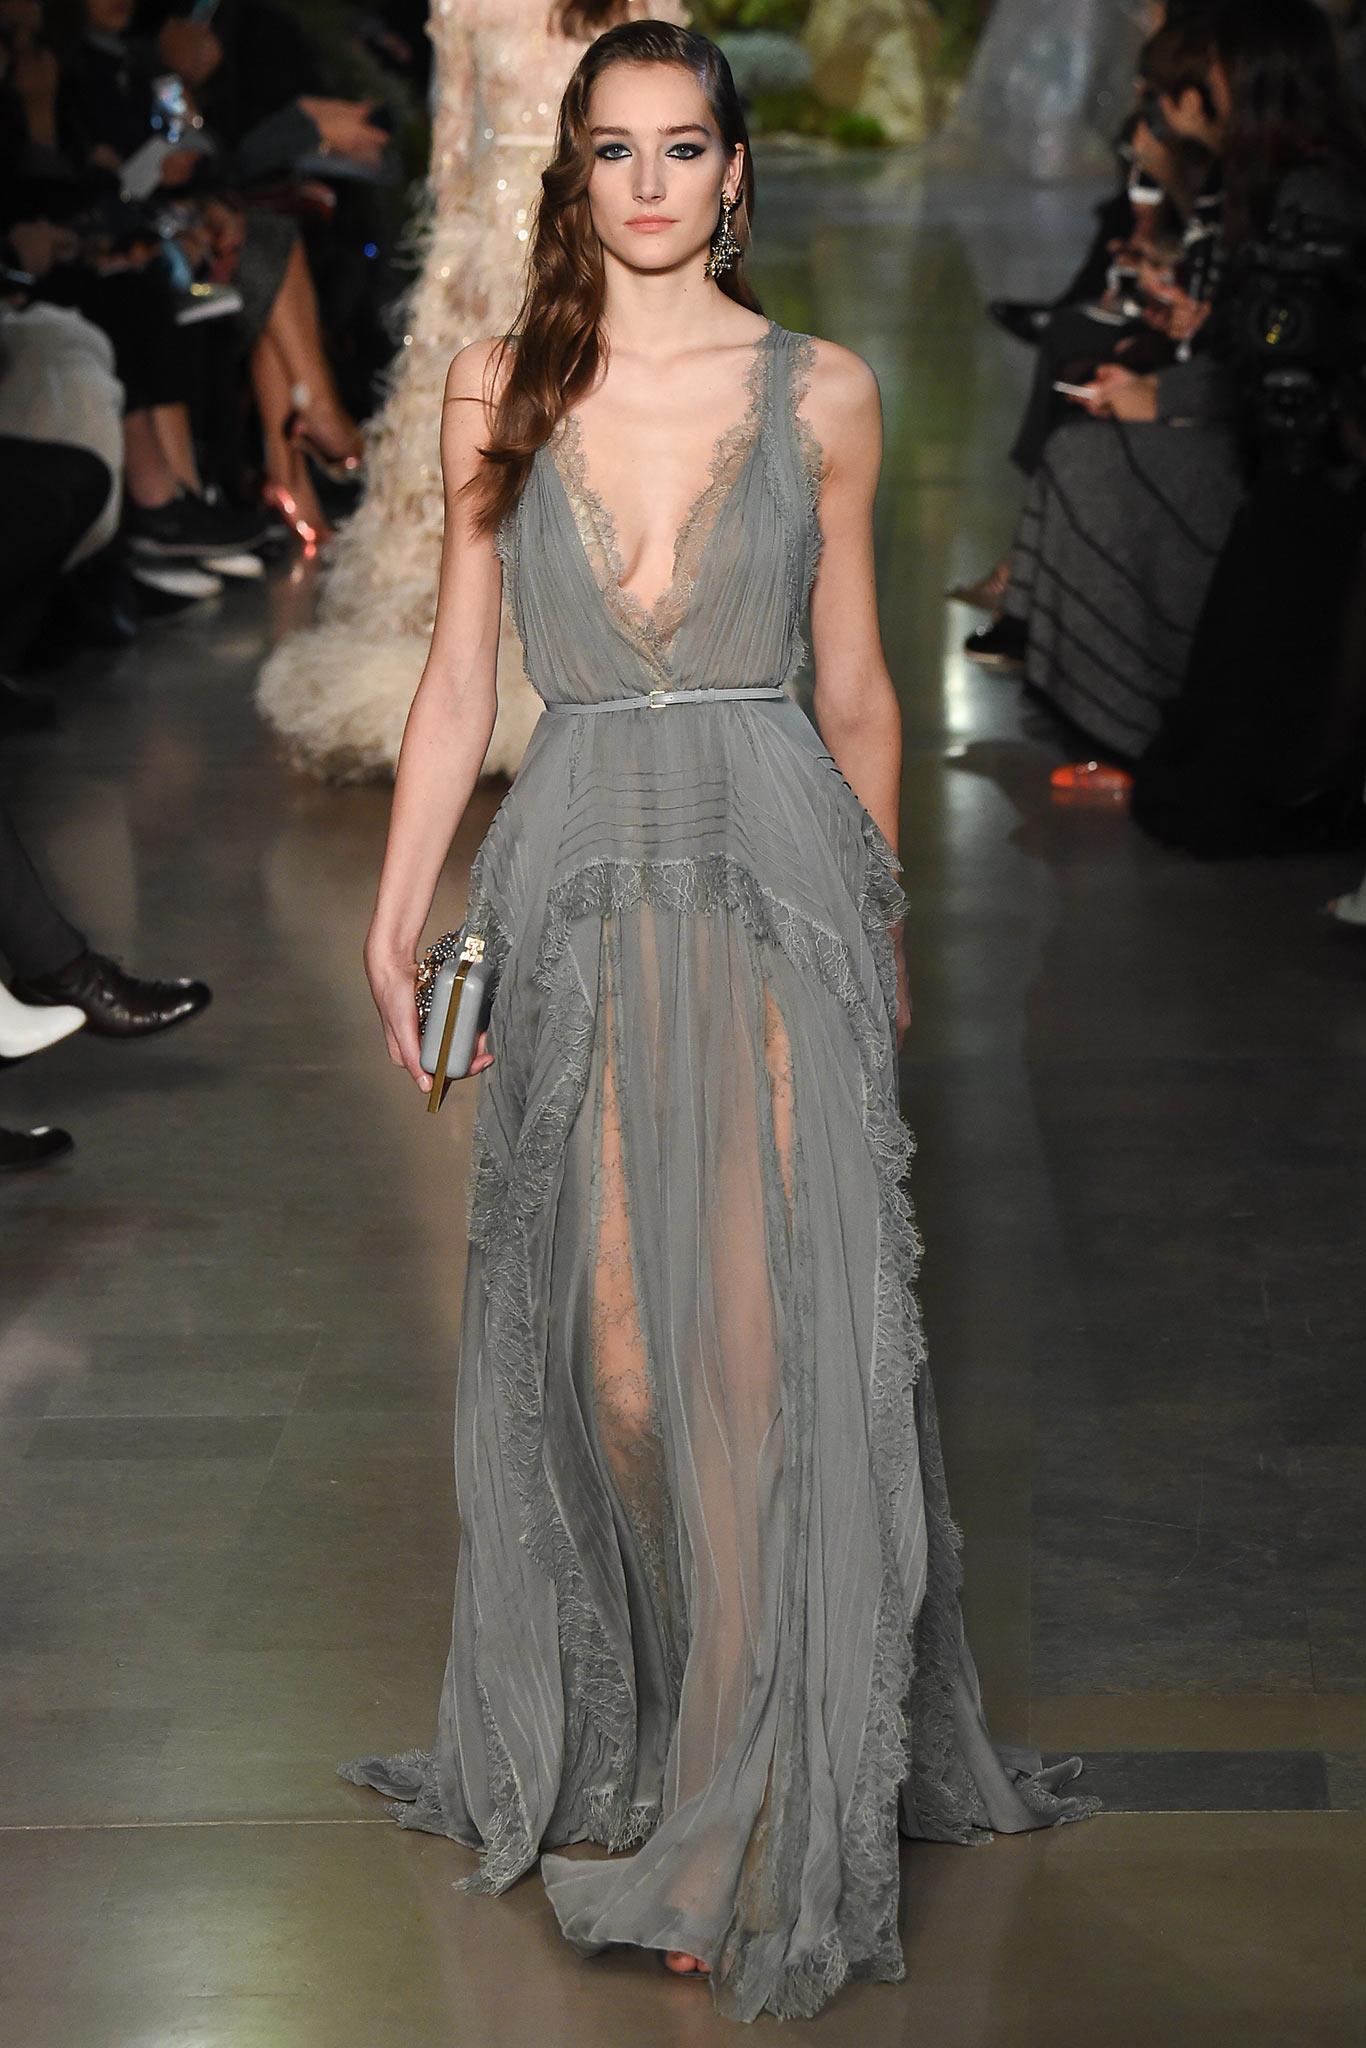 dress - Saab elie couture spring video